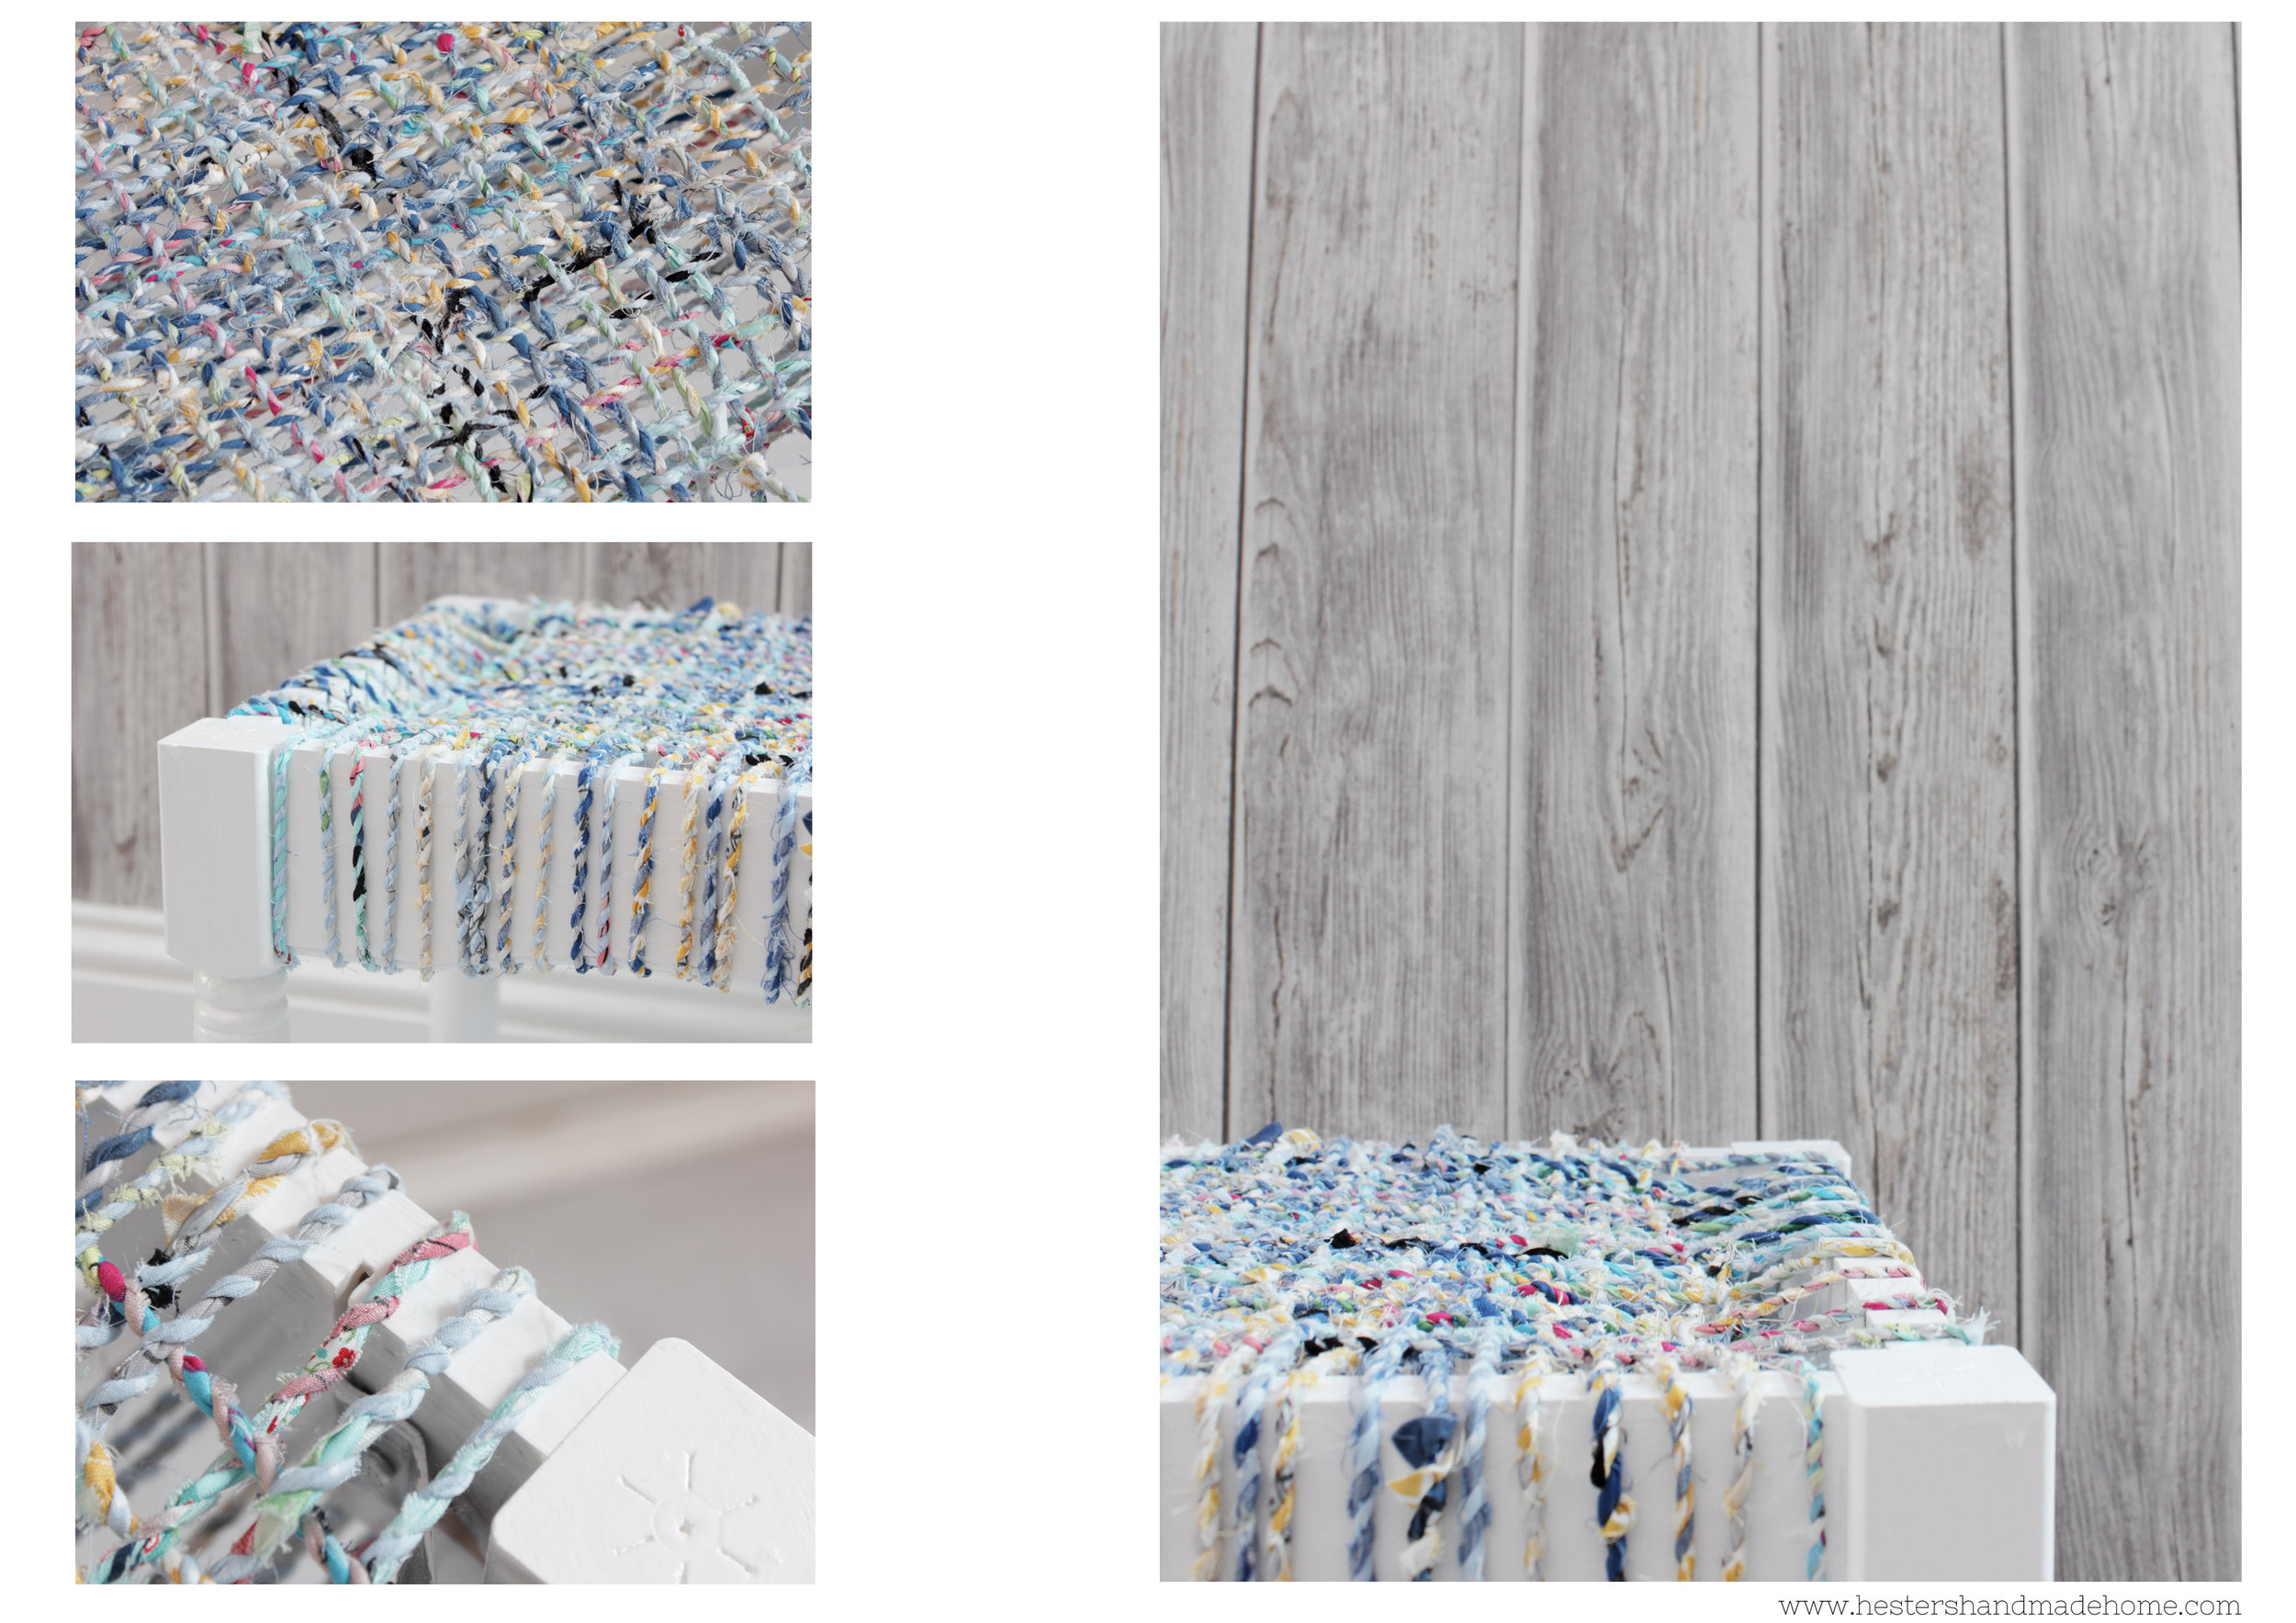 Make yarn from fabric scraps, tutorial by www.hestershandmadehome.com